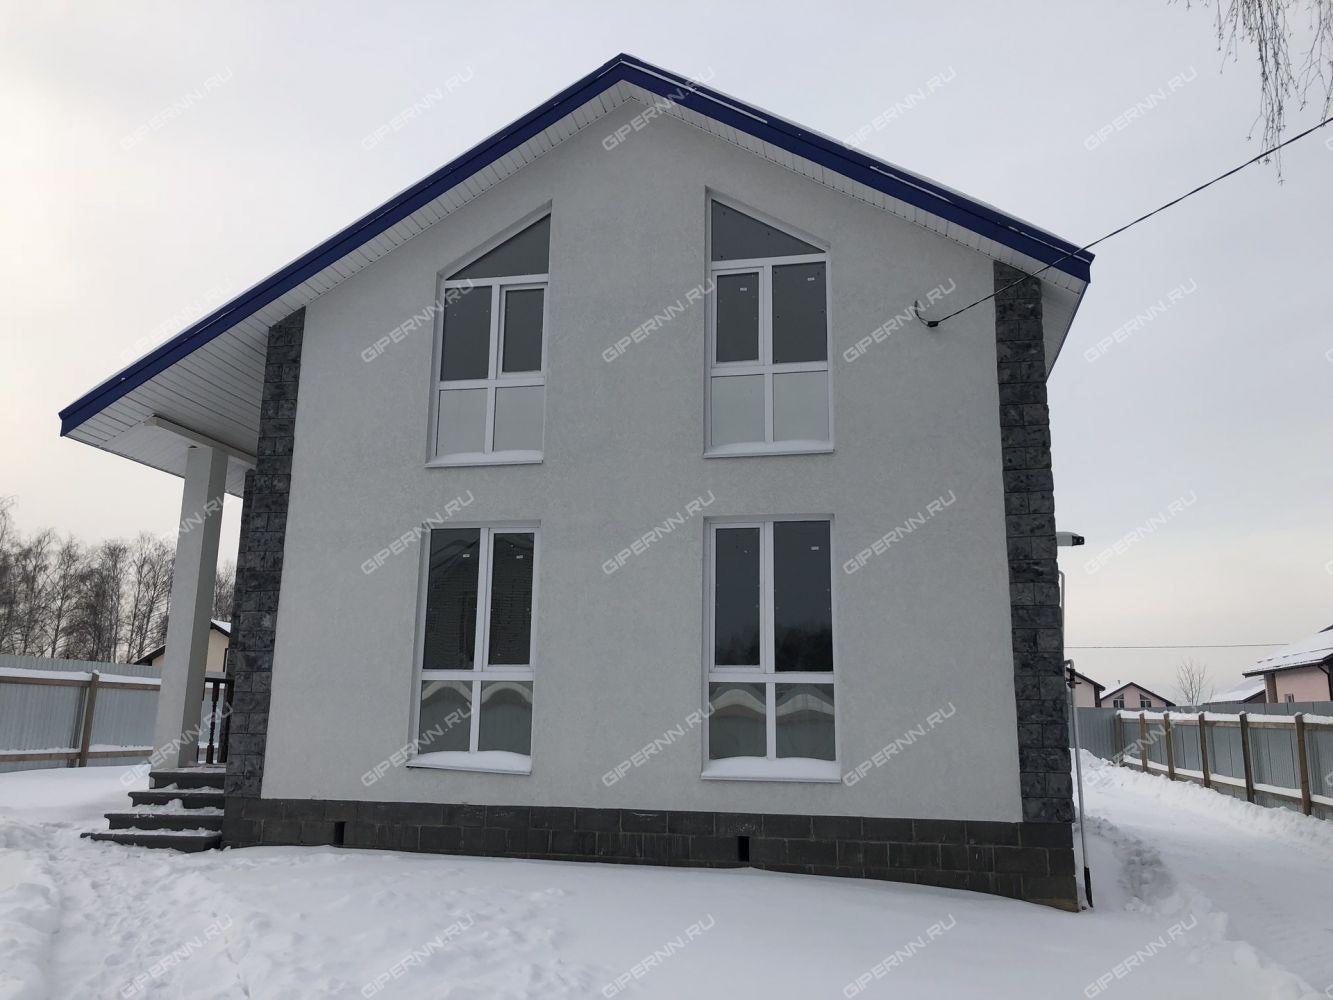 Облицовка фасада дома кирпичом - от 1350 руб квм